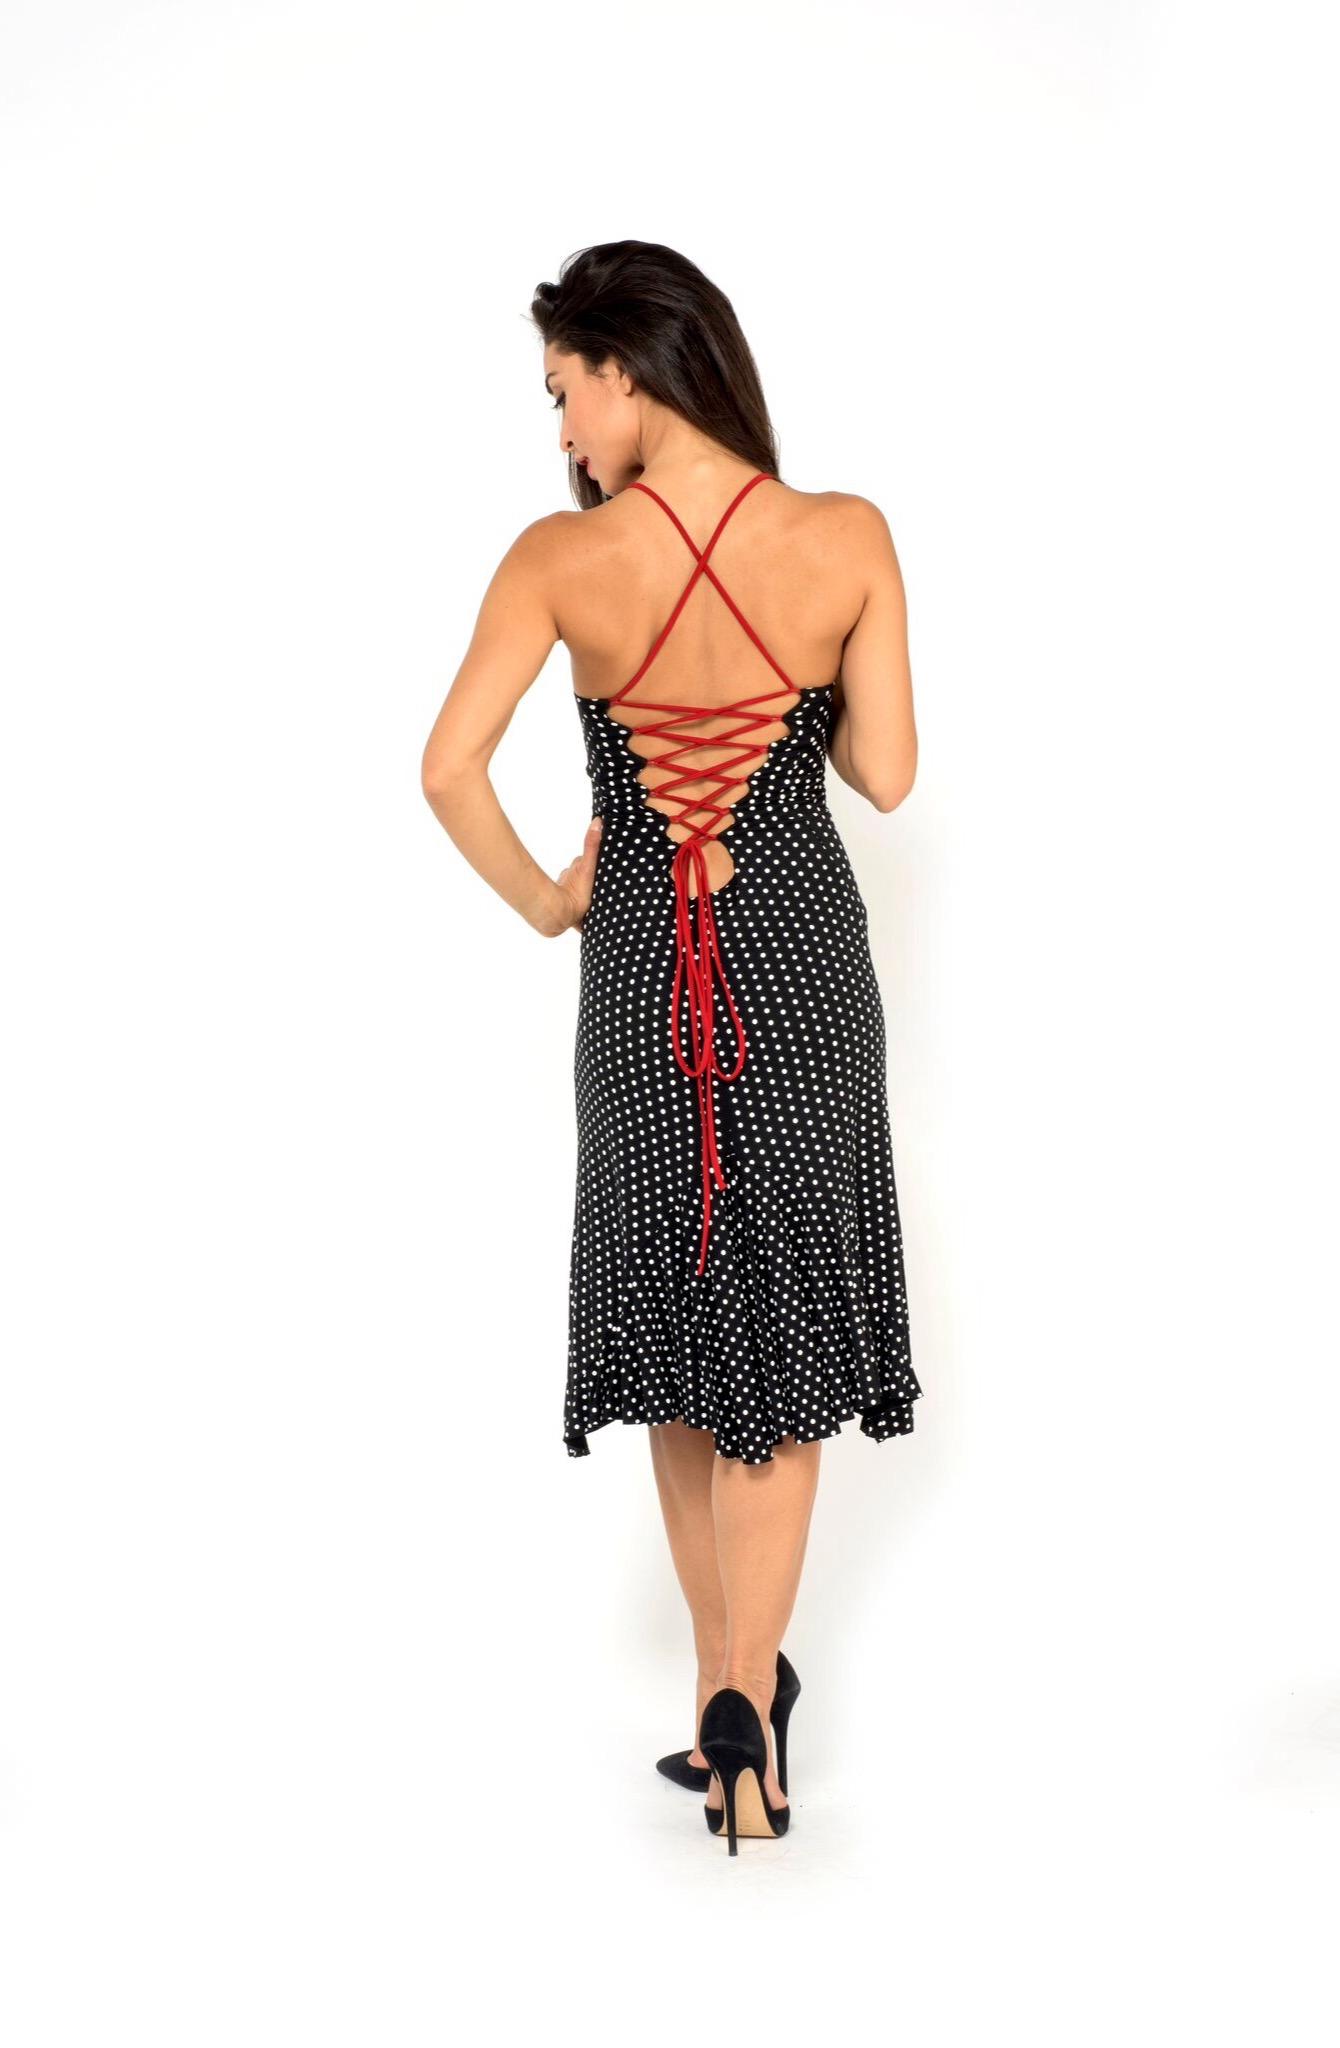 The Argentine Tango dress, polka dots, slit